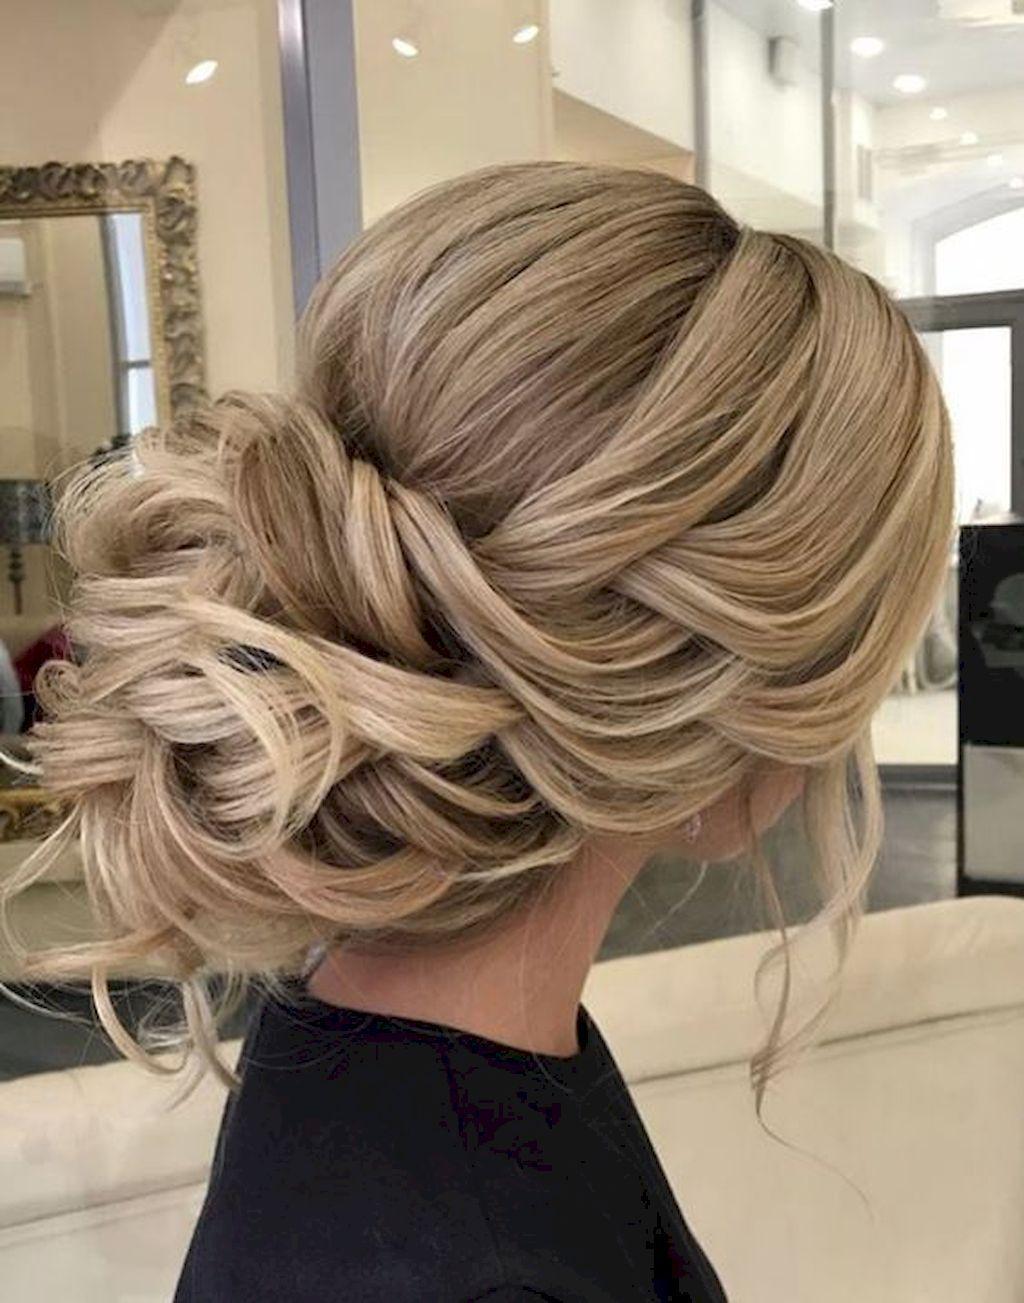 Pin by sarah woolford on hair pinterest wedding hairstyles hair